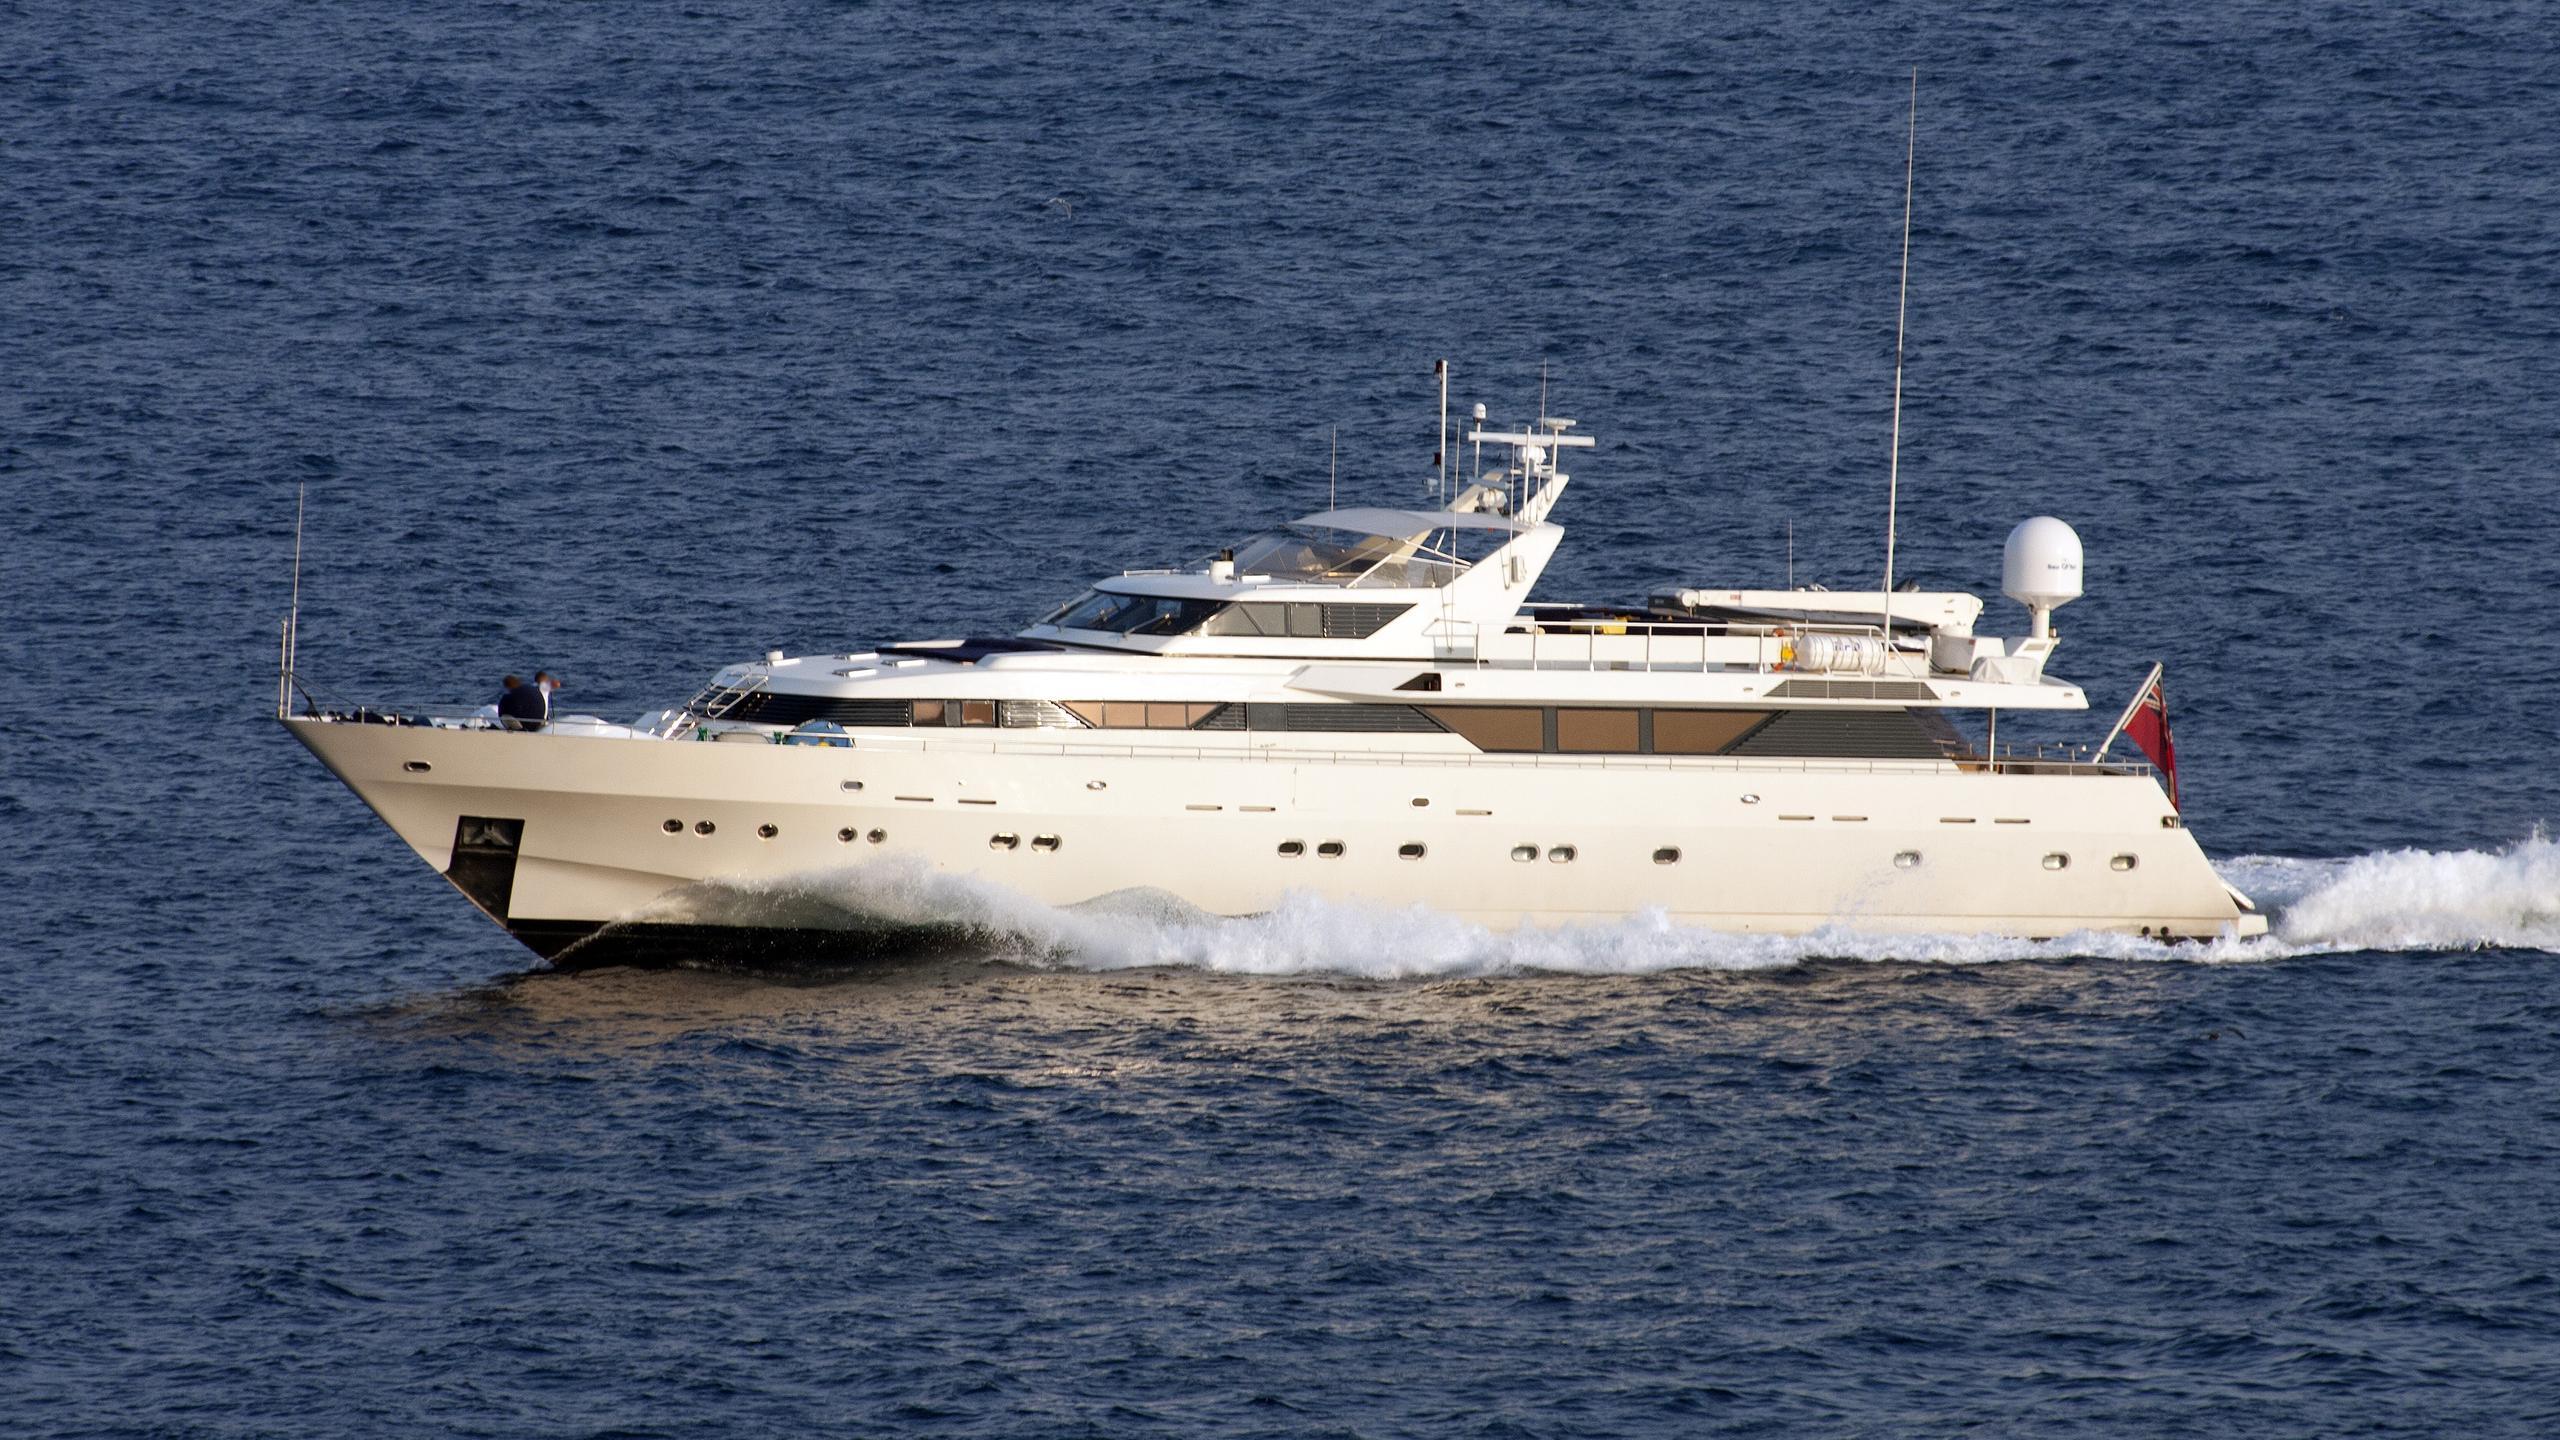 sunliner-x-motor-yacht-siar-moschini-Amital-Transat-1990-36m-profile